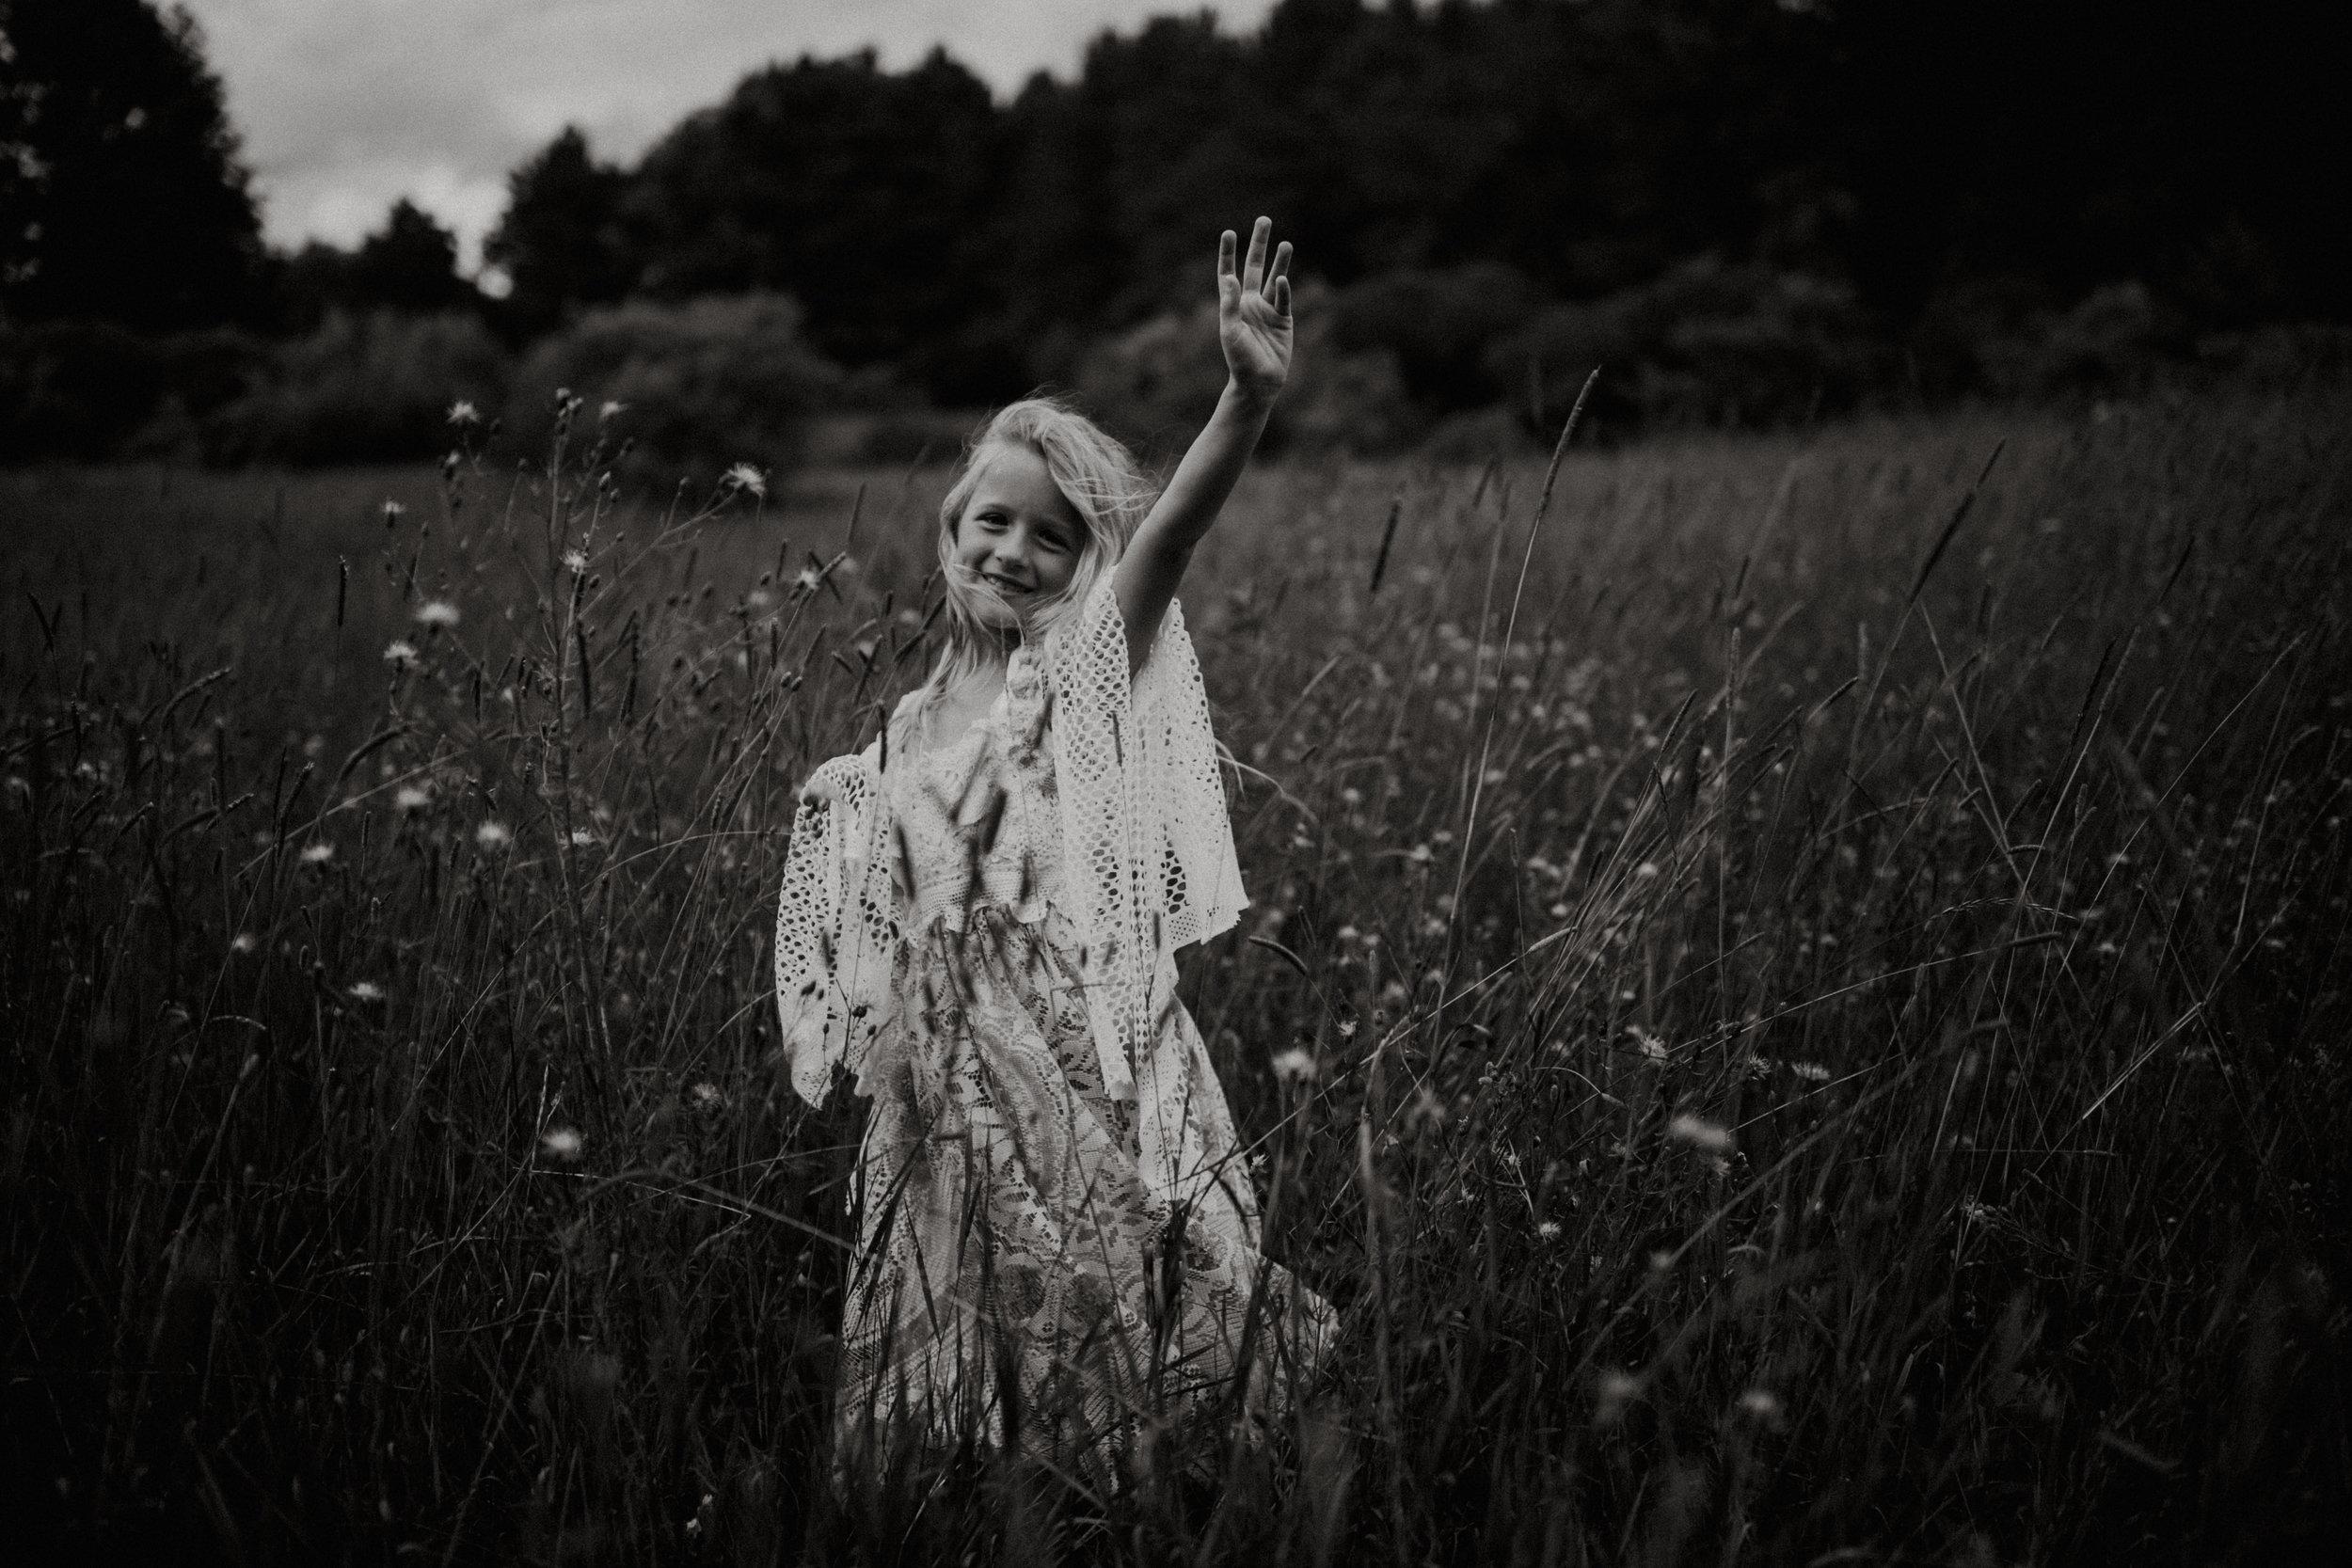 michigan-storytelling-photographer-jessica-max-reclamation-63.jpg